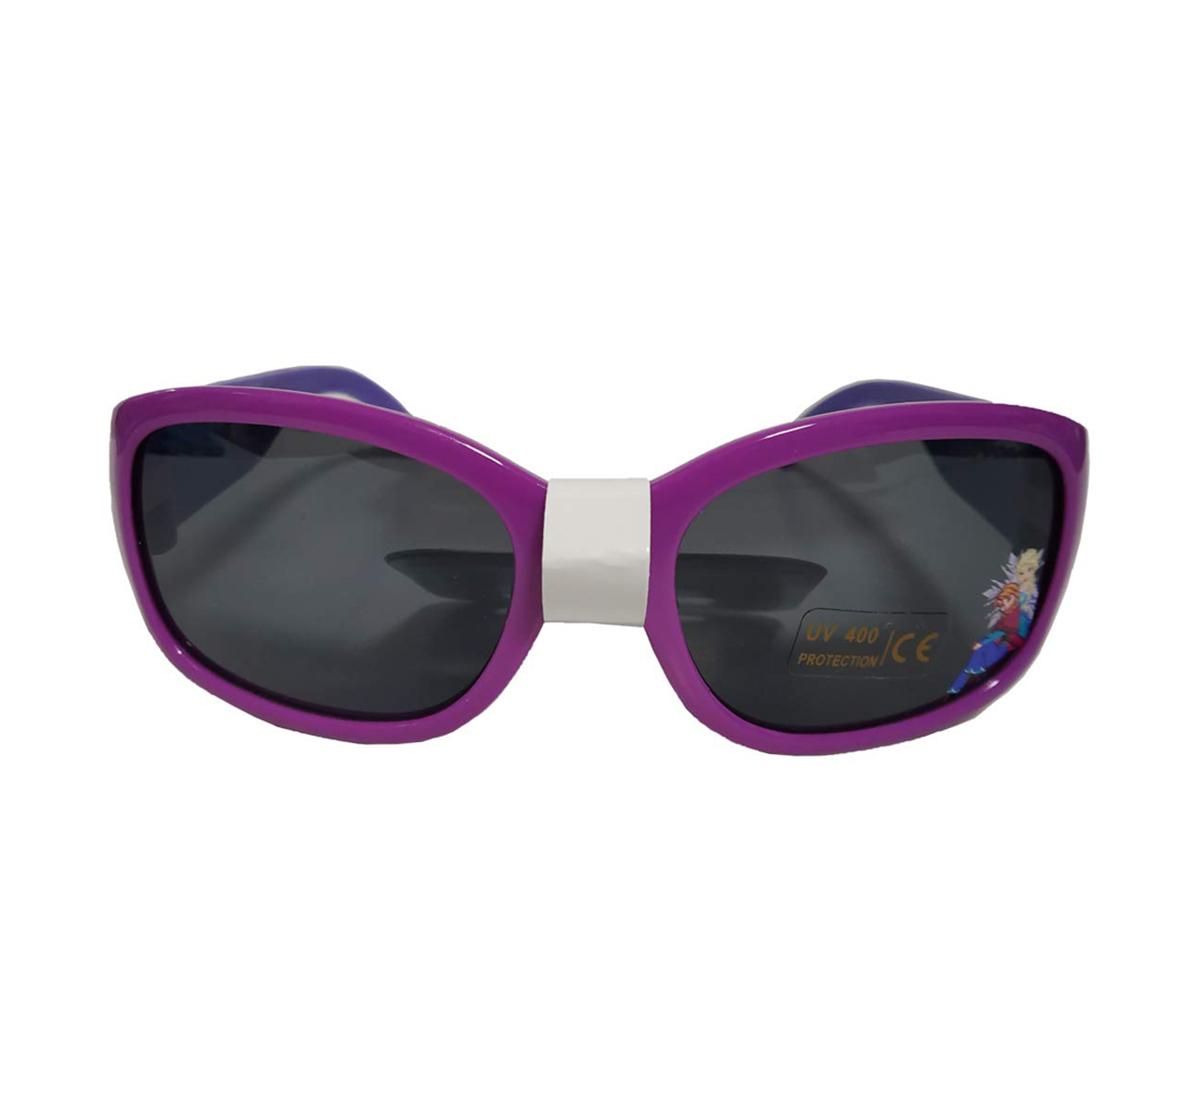 Disney | Disney Frozen Wrap Around Sunglasses for Girls age 3Y+ (Purple)